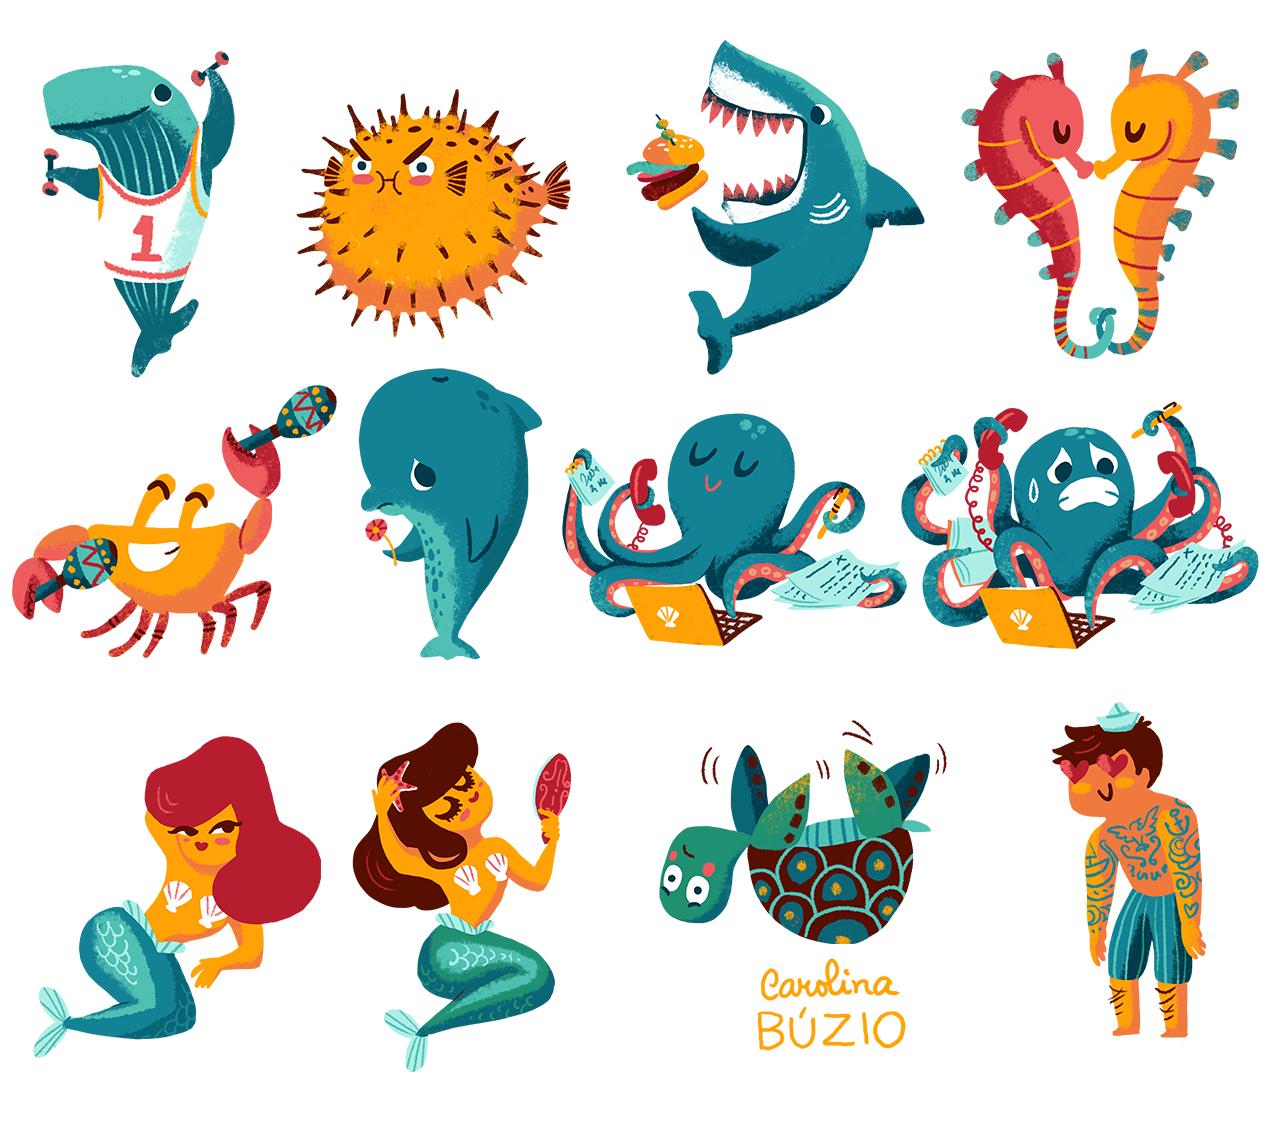 Under The Sea Collection Carolina Buzio S Blog Animal Design Poster Sea Illustration Freelance Illustrator